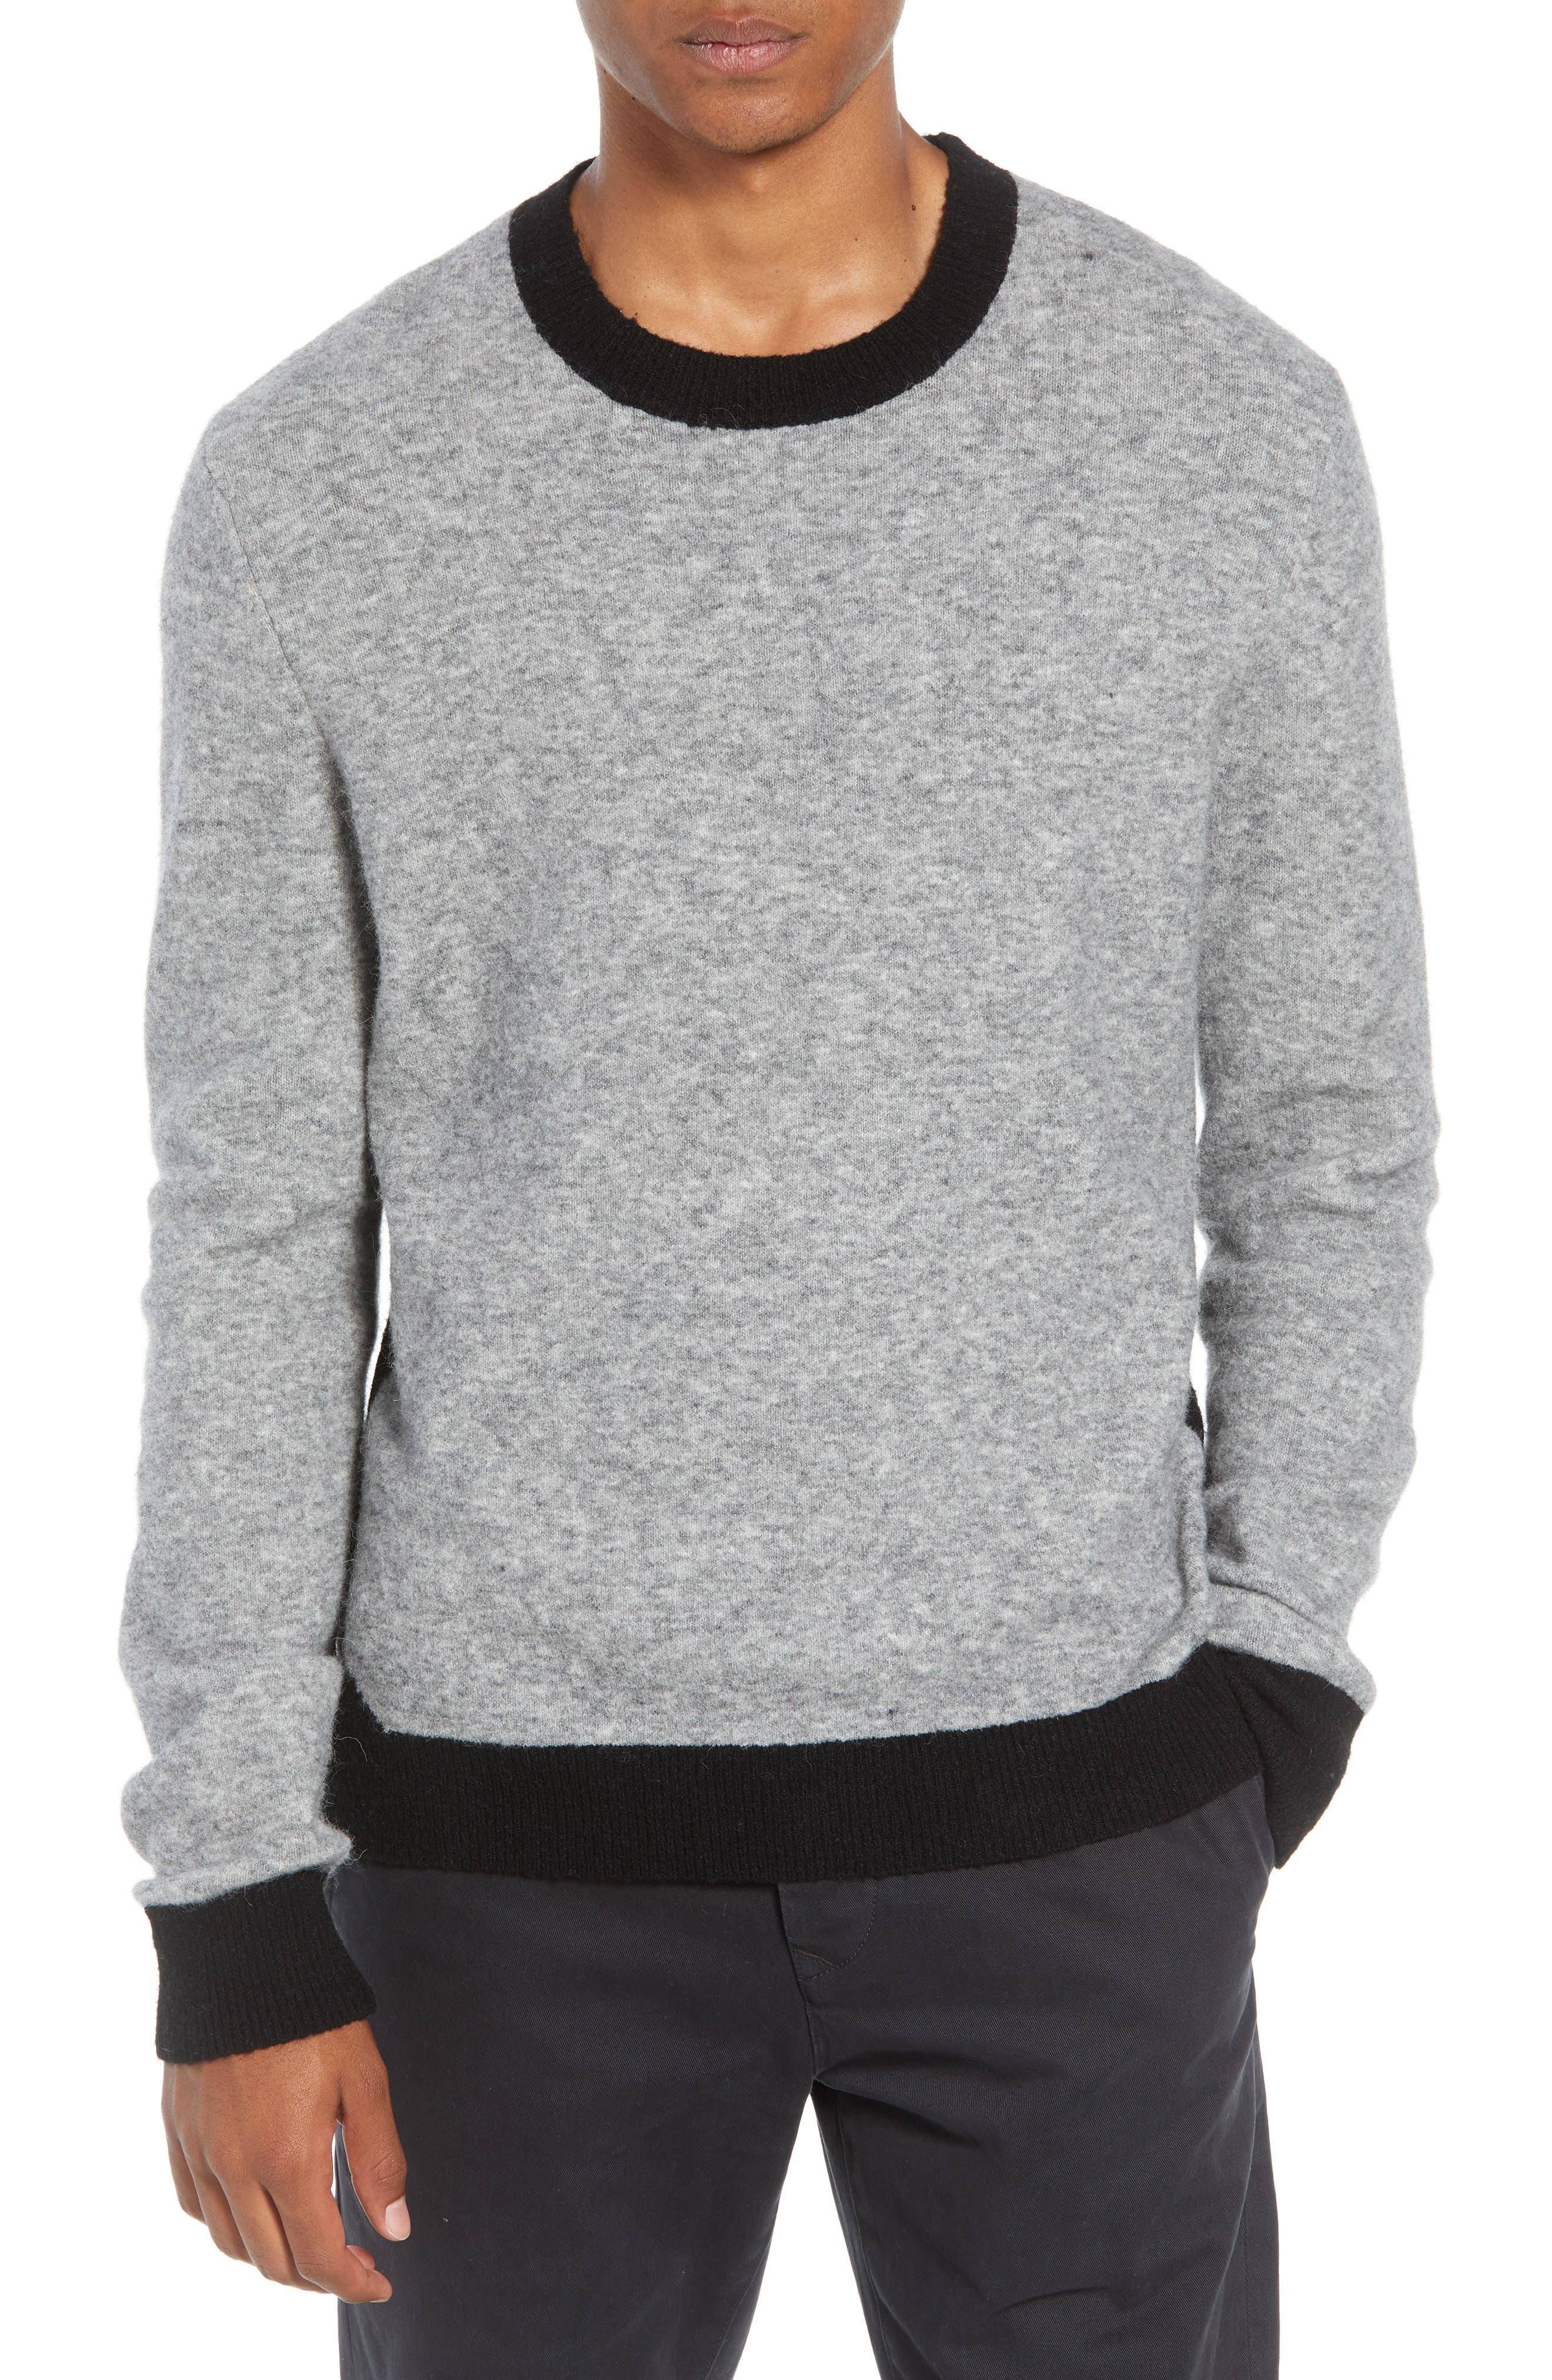 Clermont Slim Fit Crewneck Sweater,                         Main,                         color, LIGHT HEATHER GREY